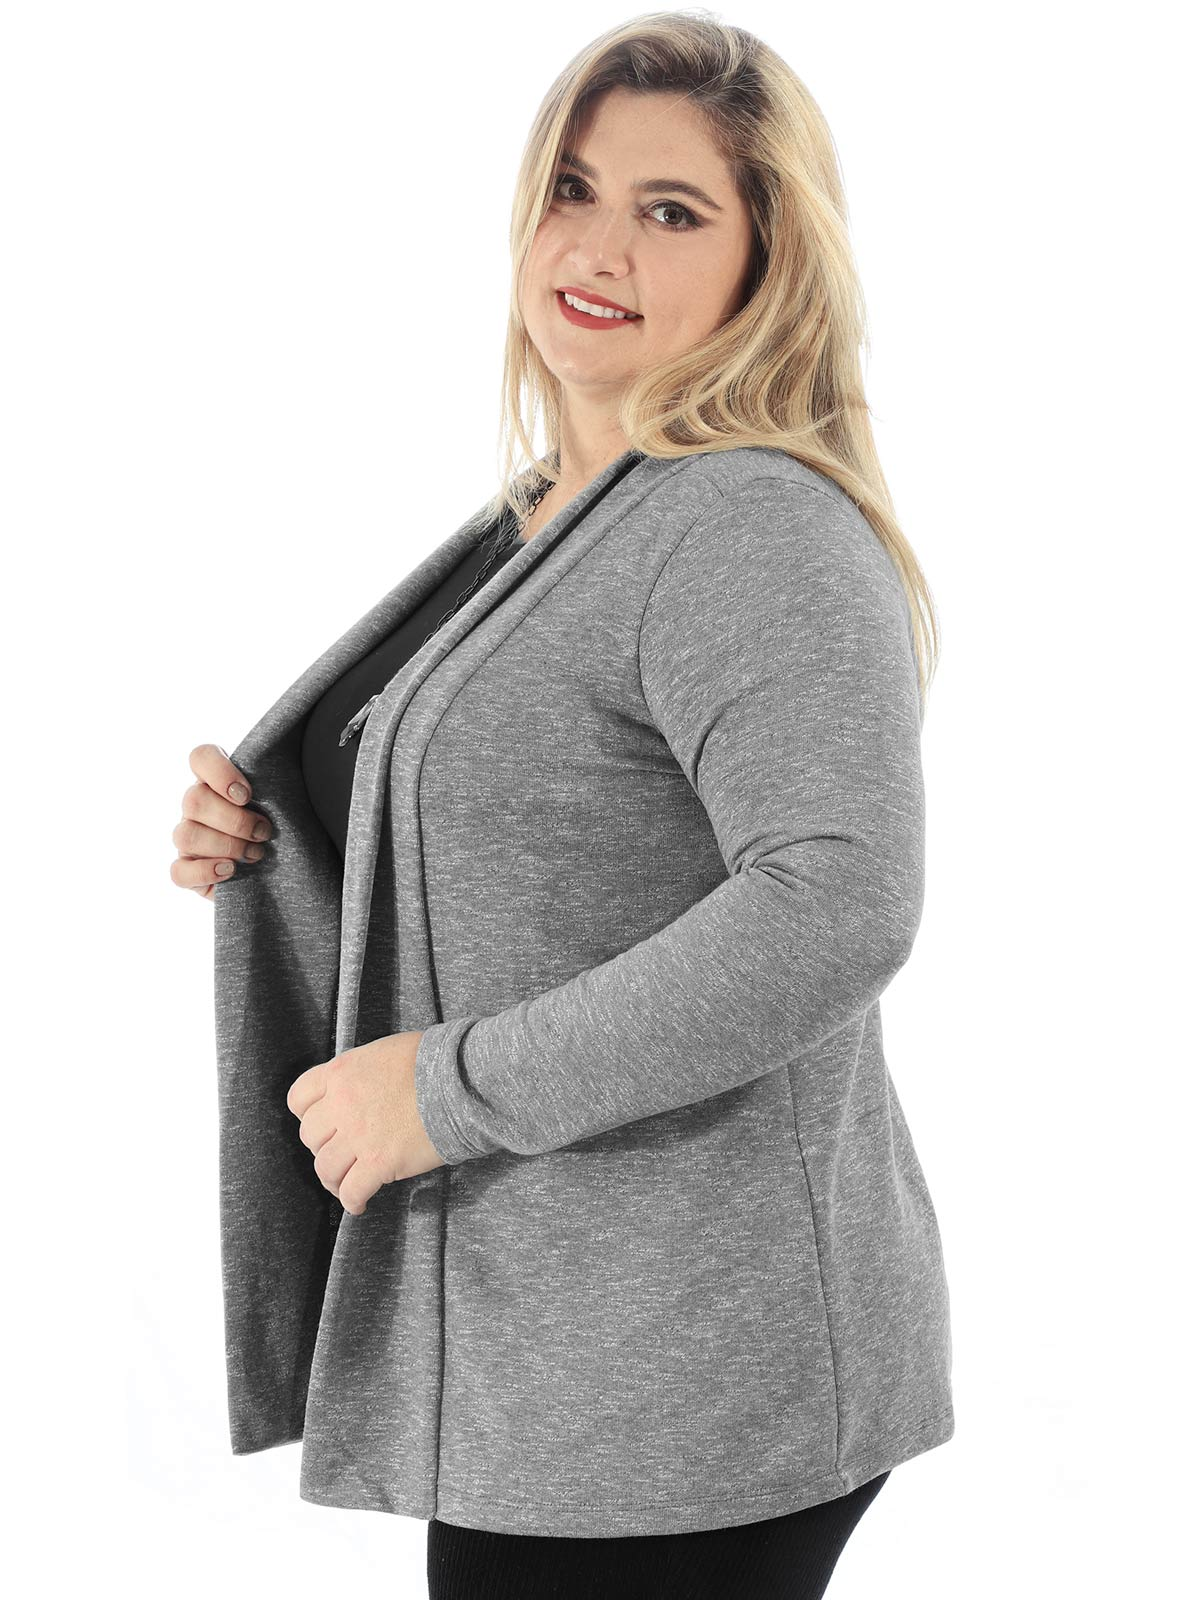 Cardigan Feminino Plus Size De Moletom Anistia Mescla